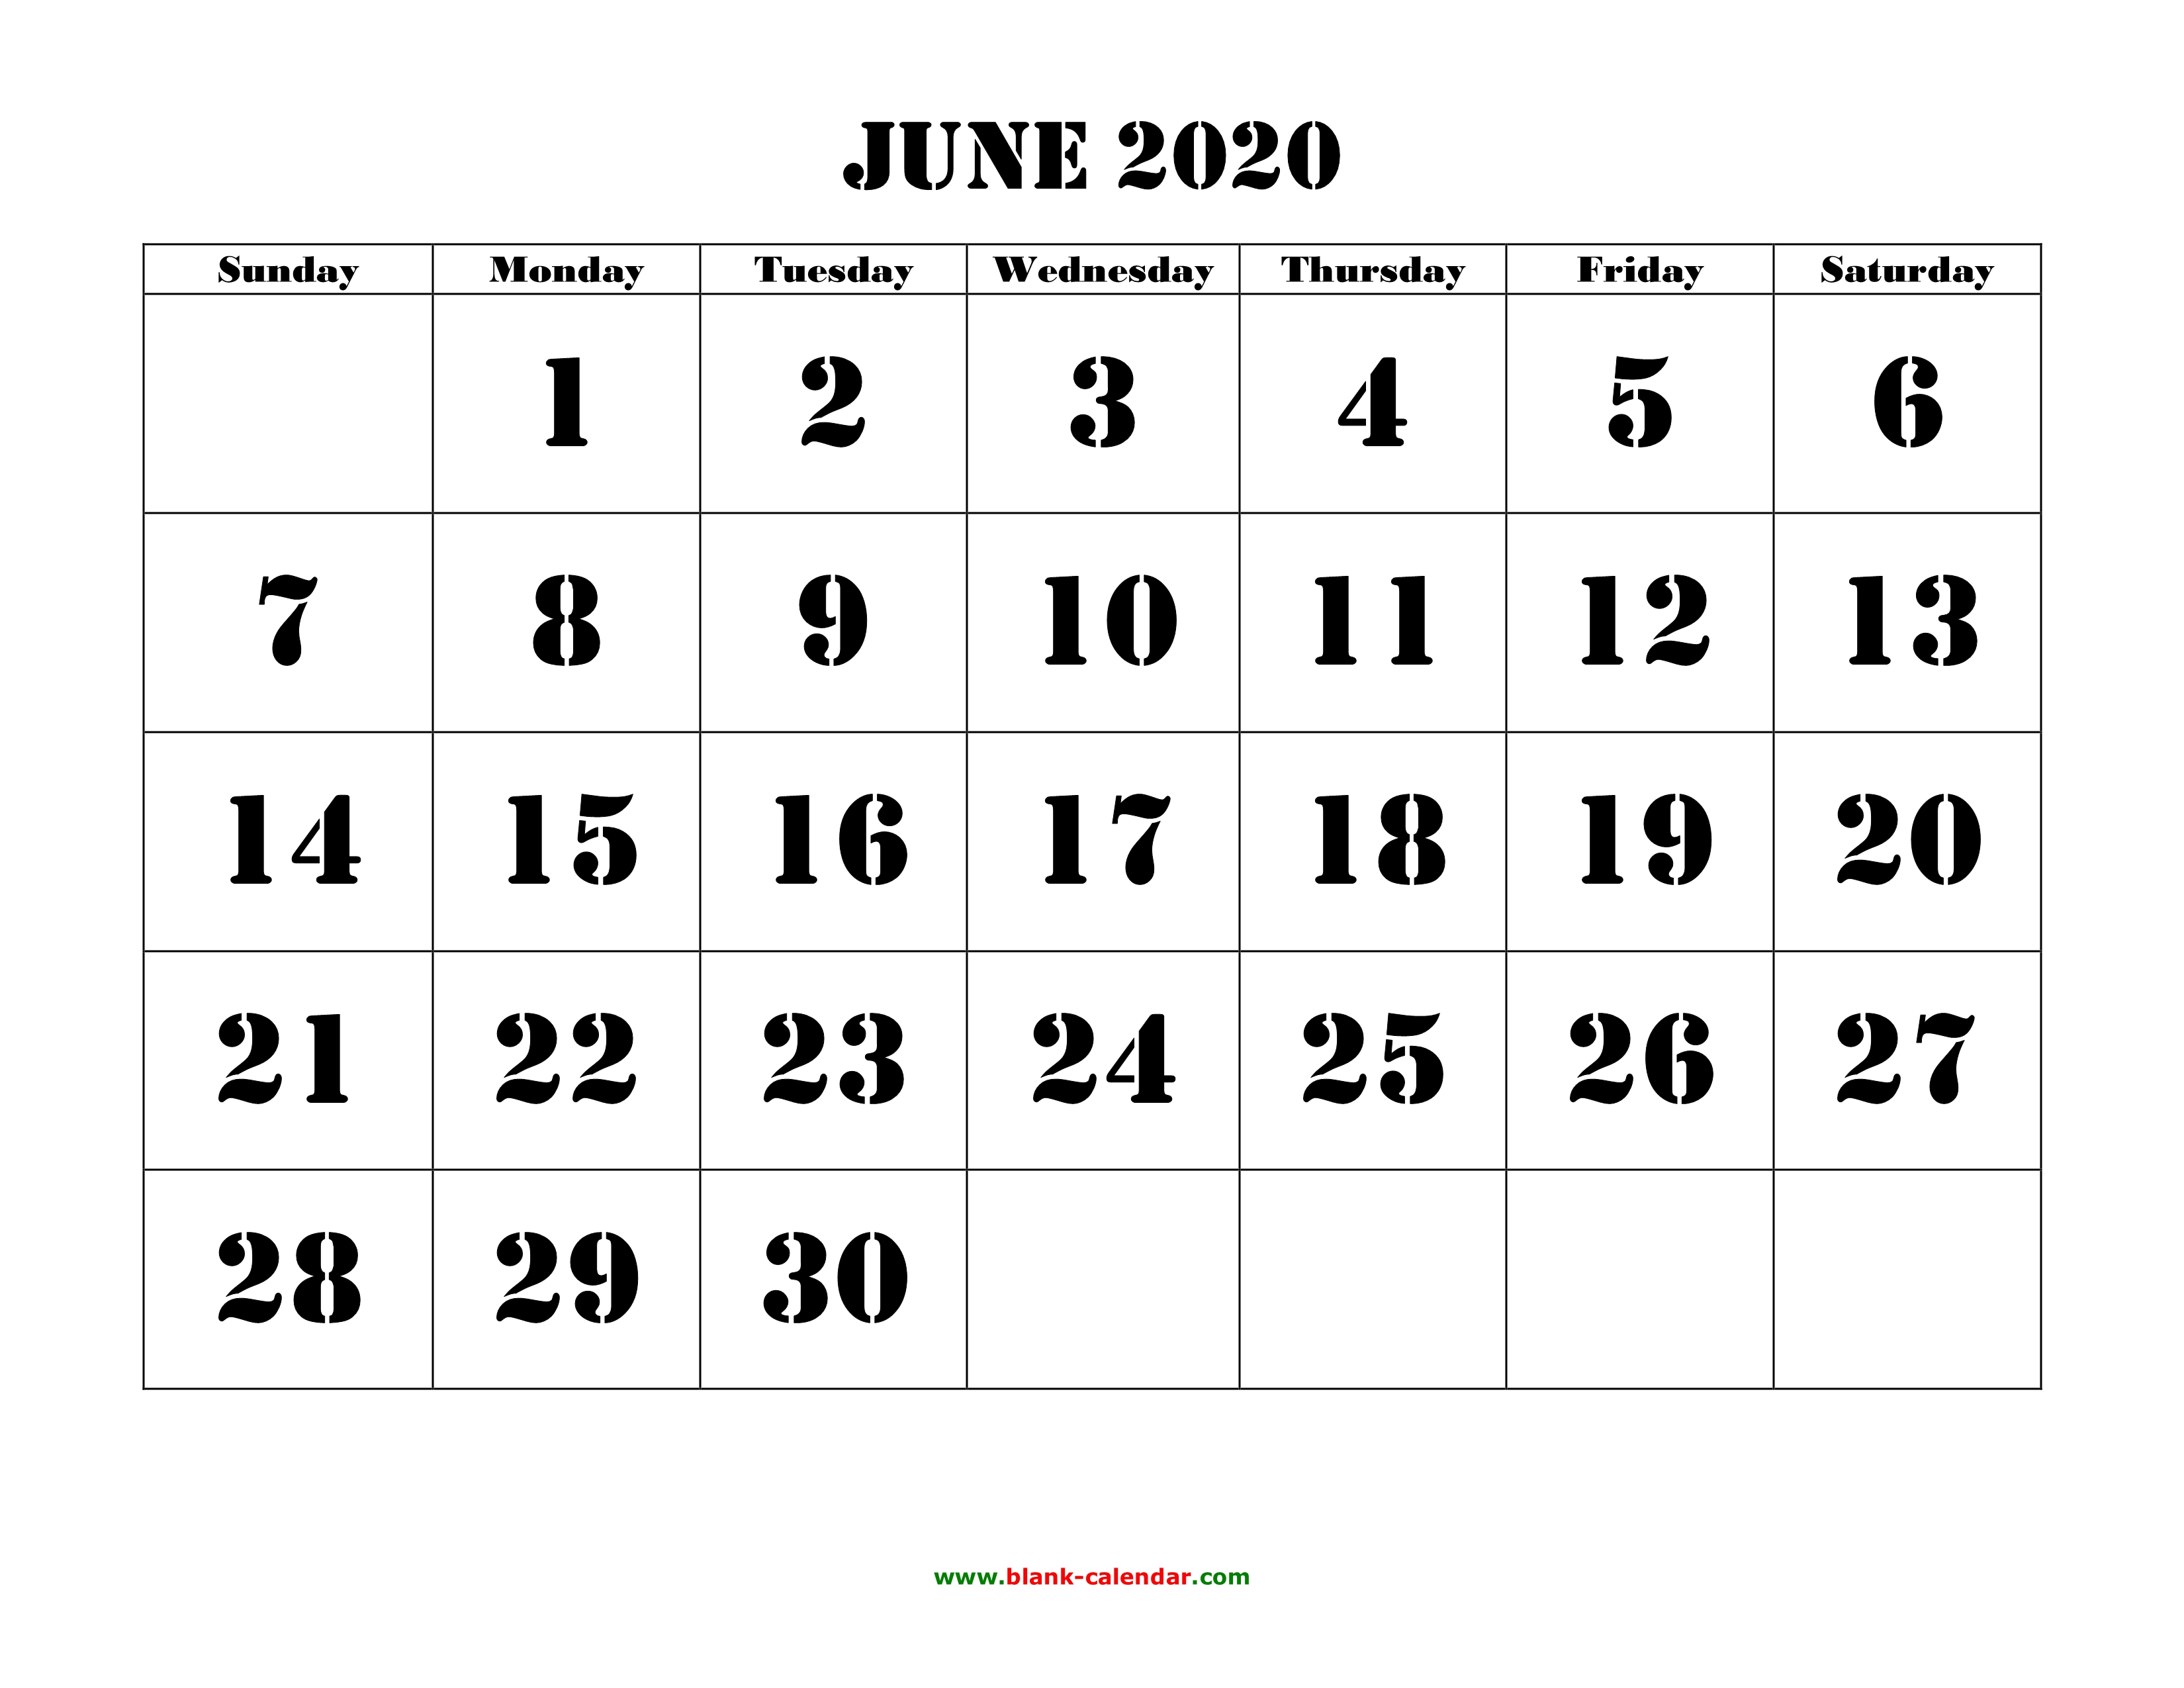 June 2020 Printable Calendar | Free Download Monthly